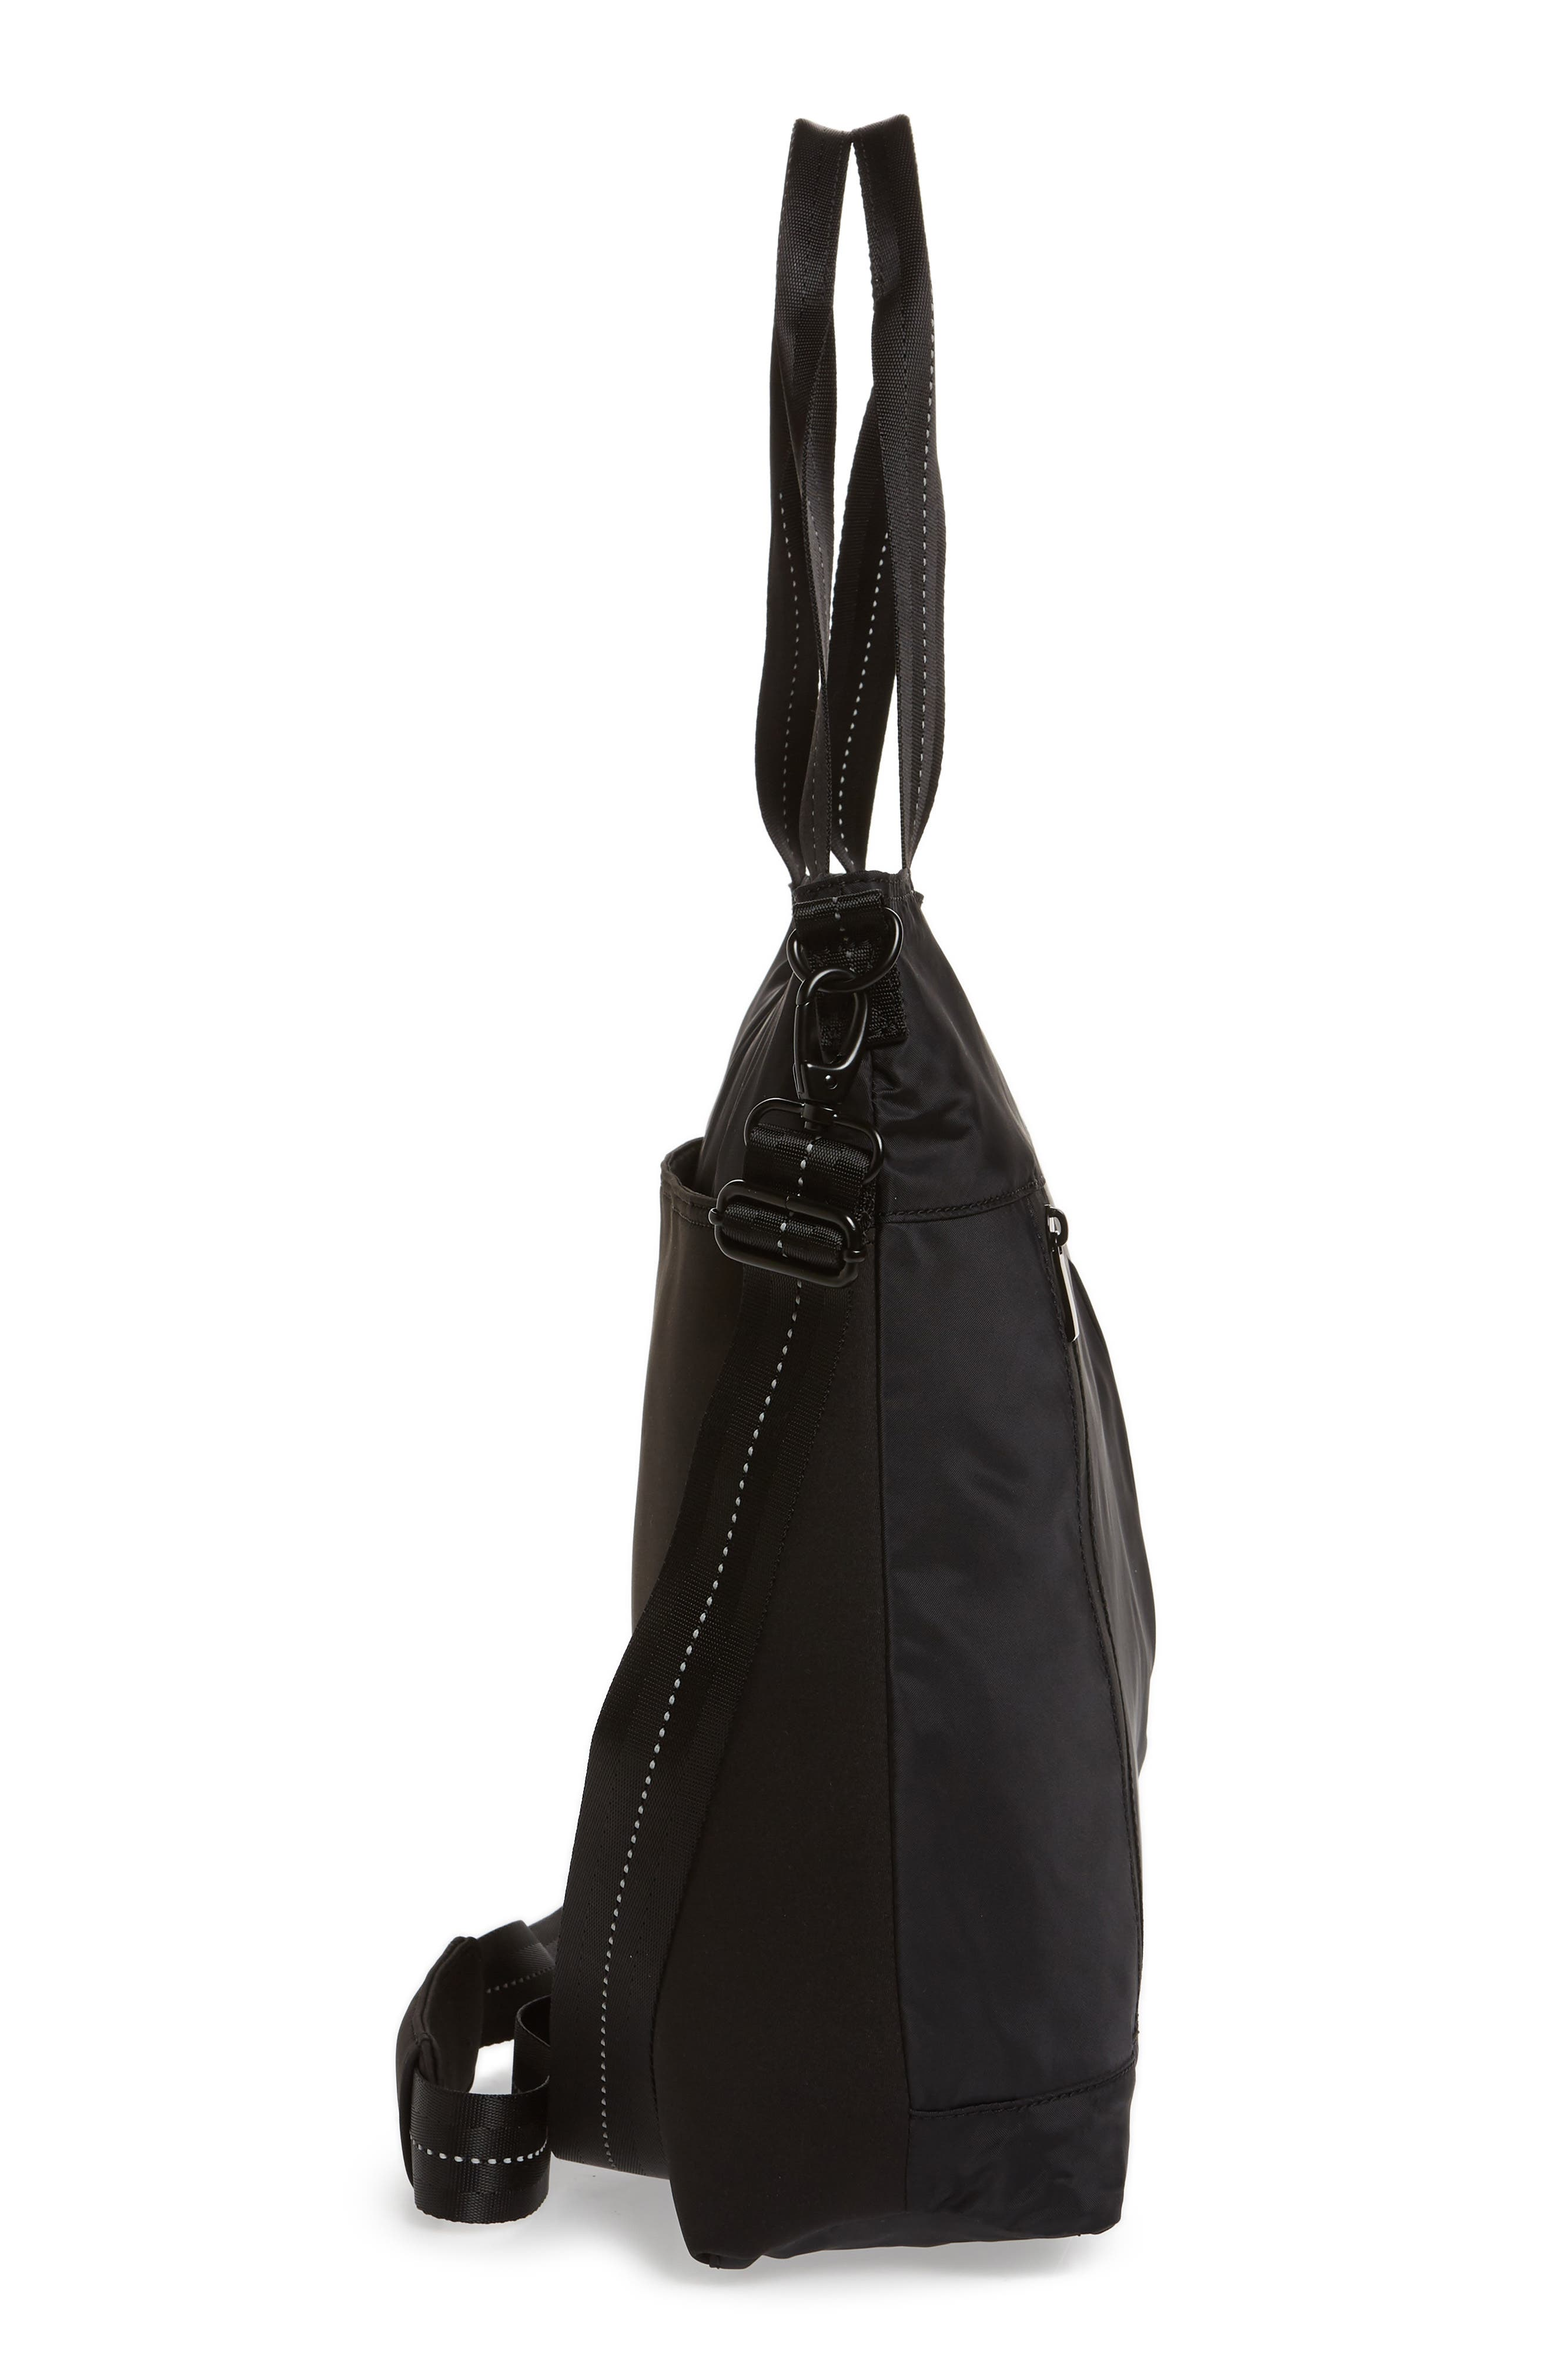 ZELLA, Reflective Nylon Tote Bag, Alternate thumbnail 6, color, BLACK